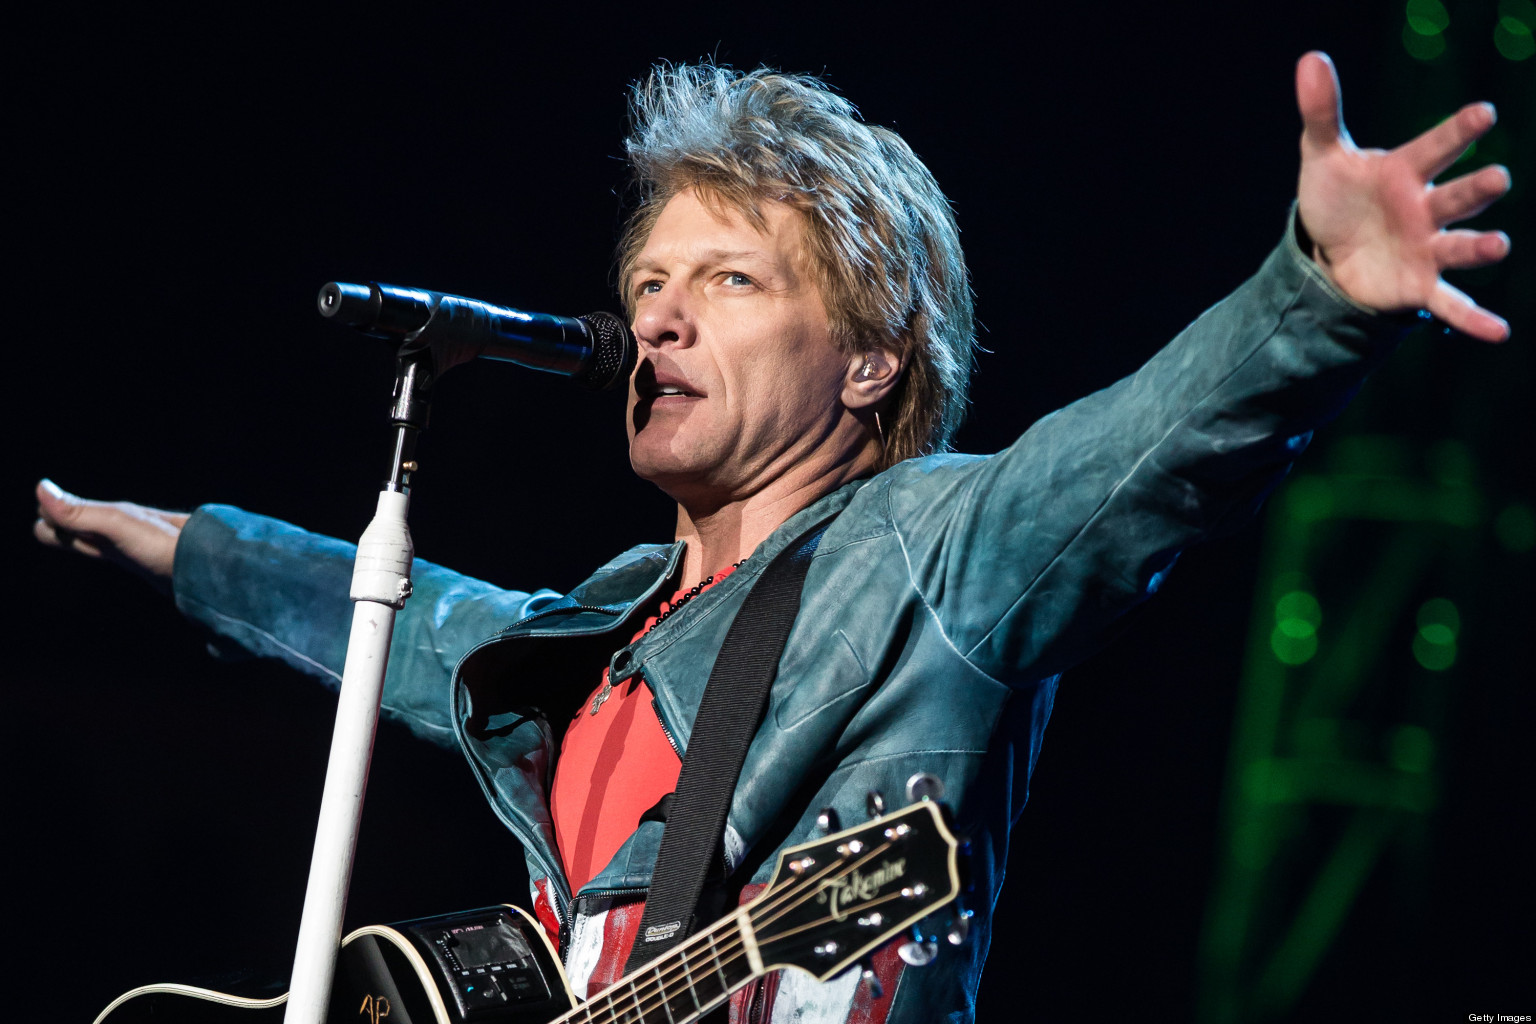 2 marzo 1962 - nasce Jon Bon Jovi